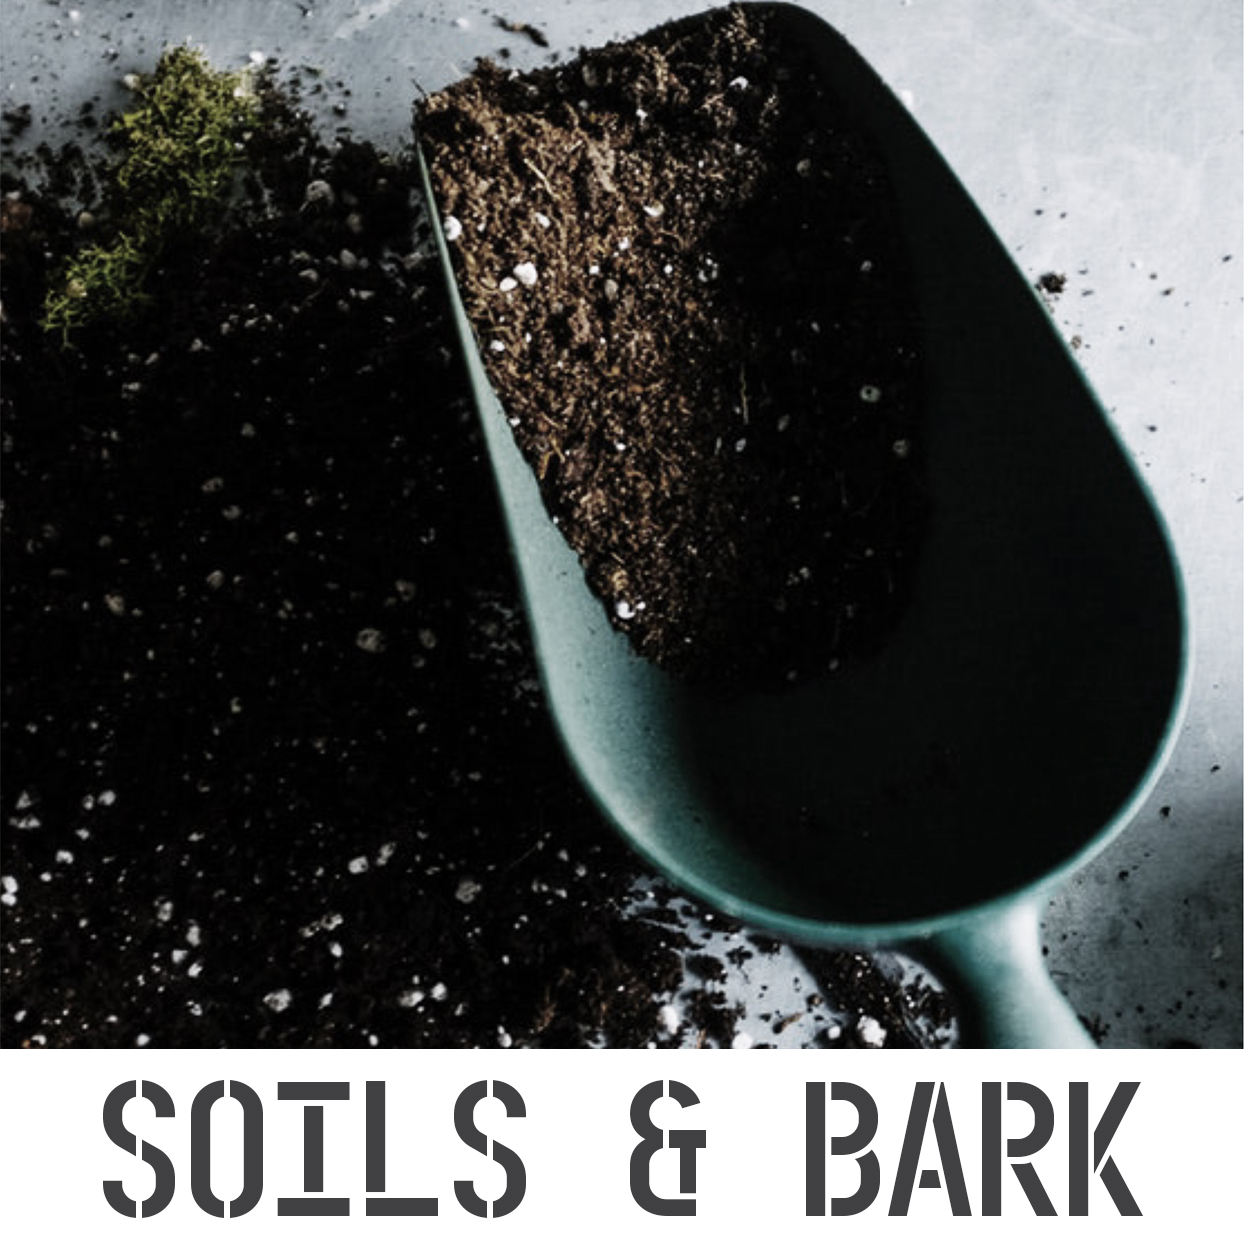 SOILS & BARK R.jpg